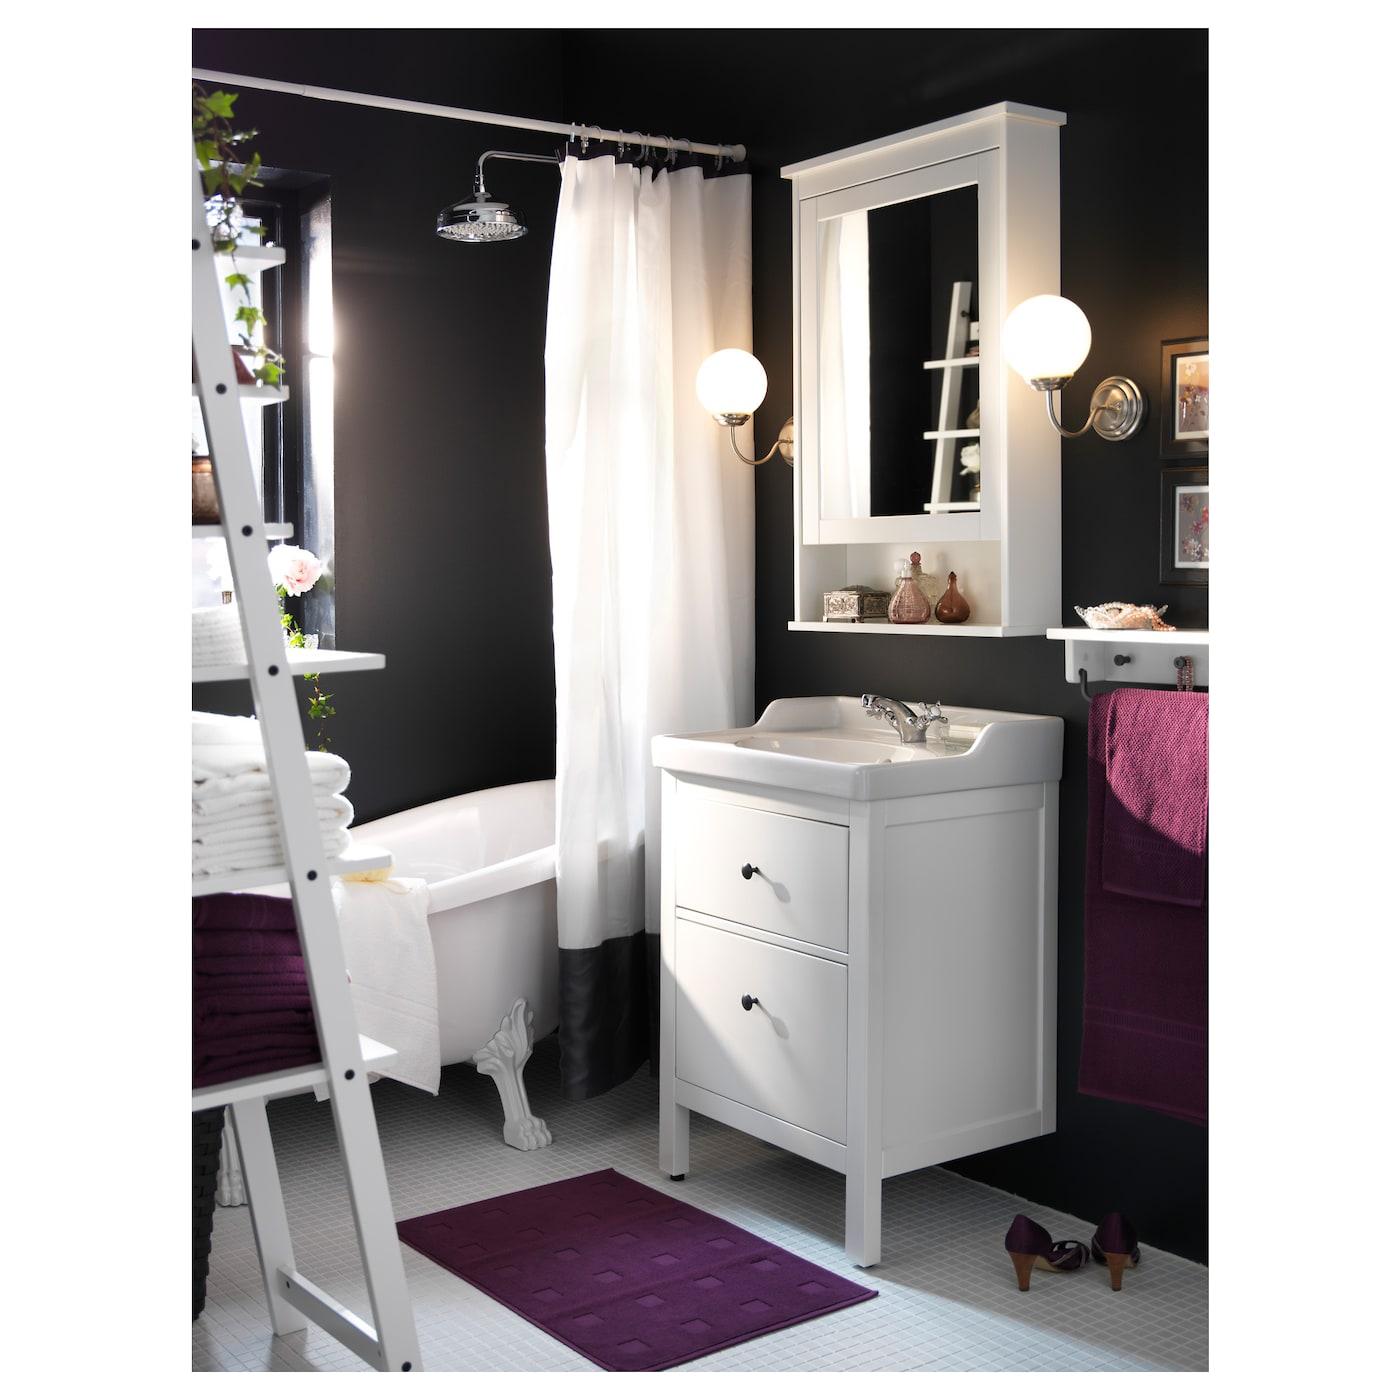 hemnes r ttviken meuble lavabo 2tir blanc 60x49x89 cm ikea. Black Bedroom Furniture Sets. Home Design Ideas